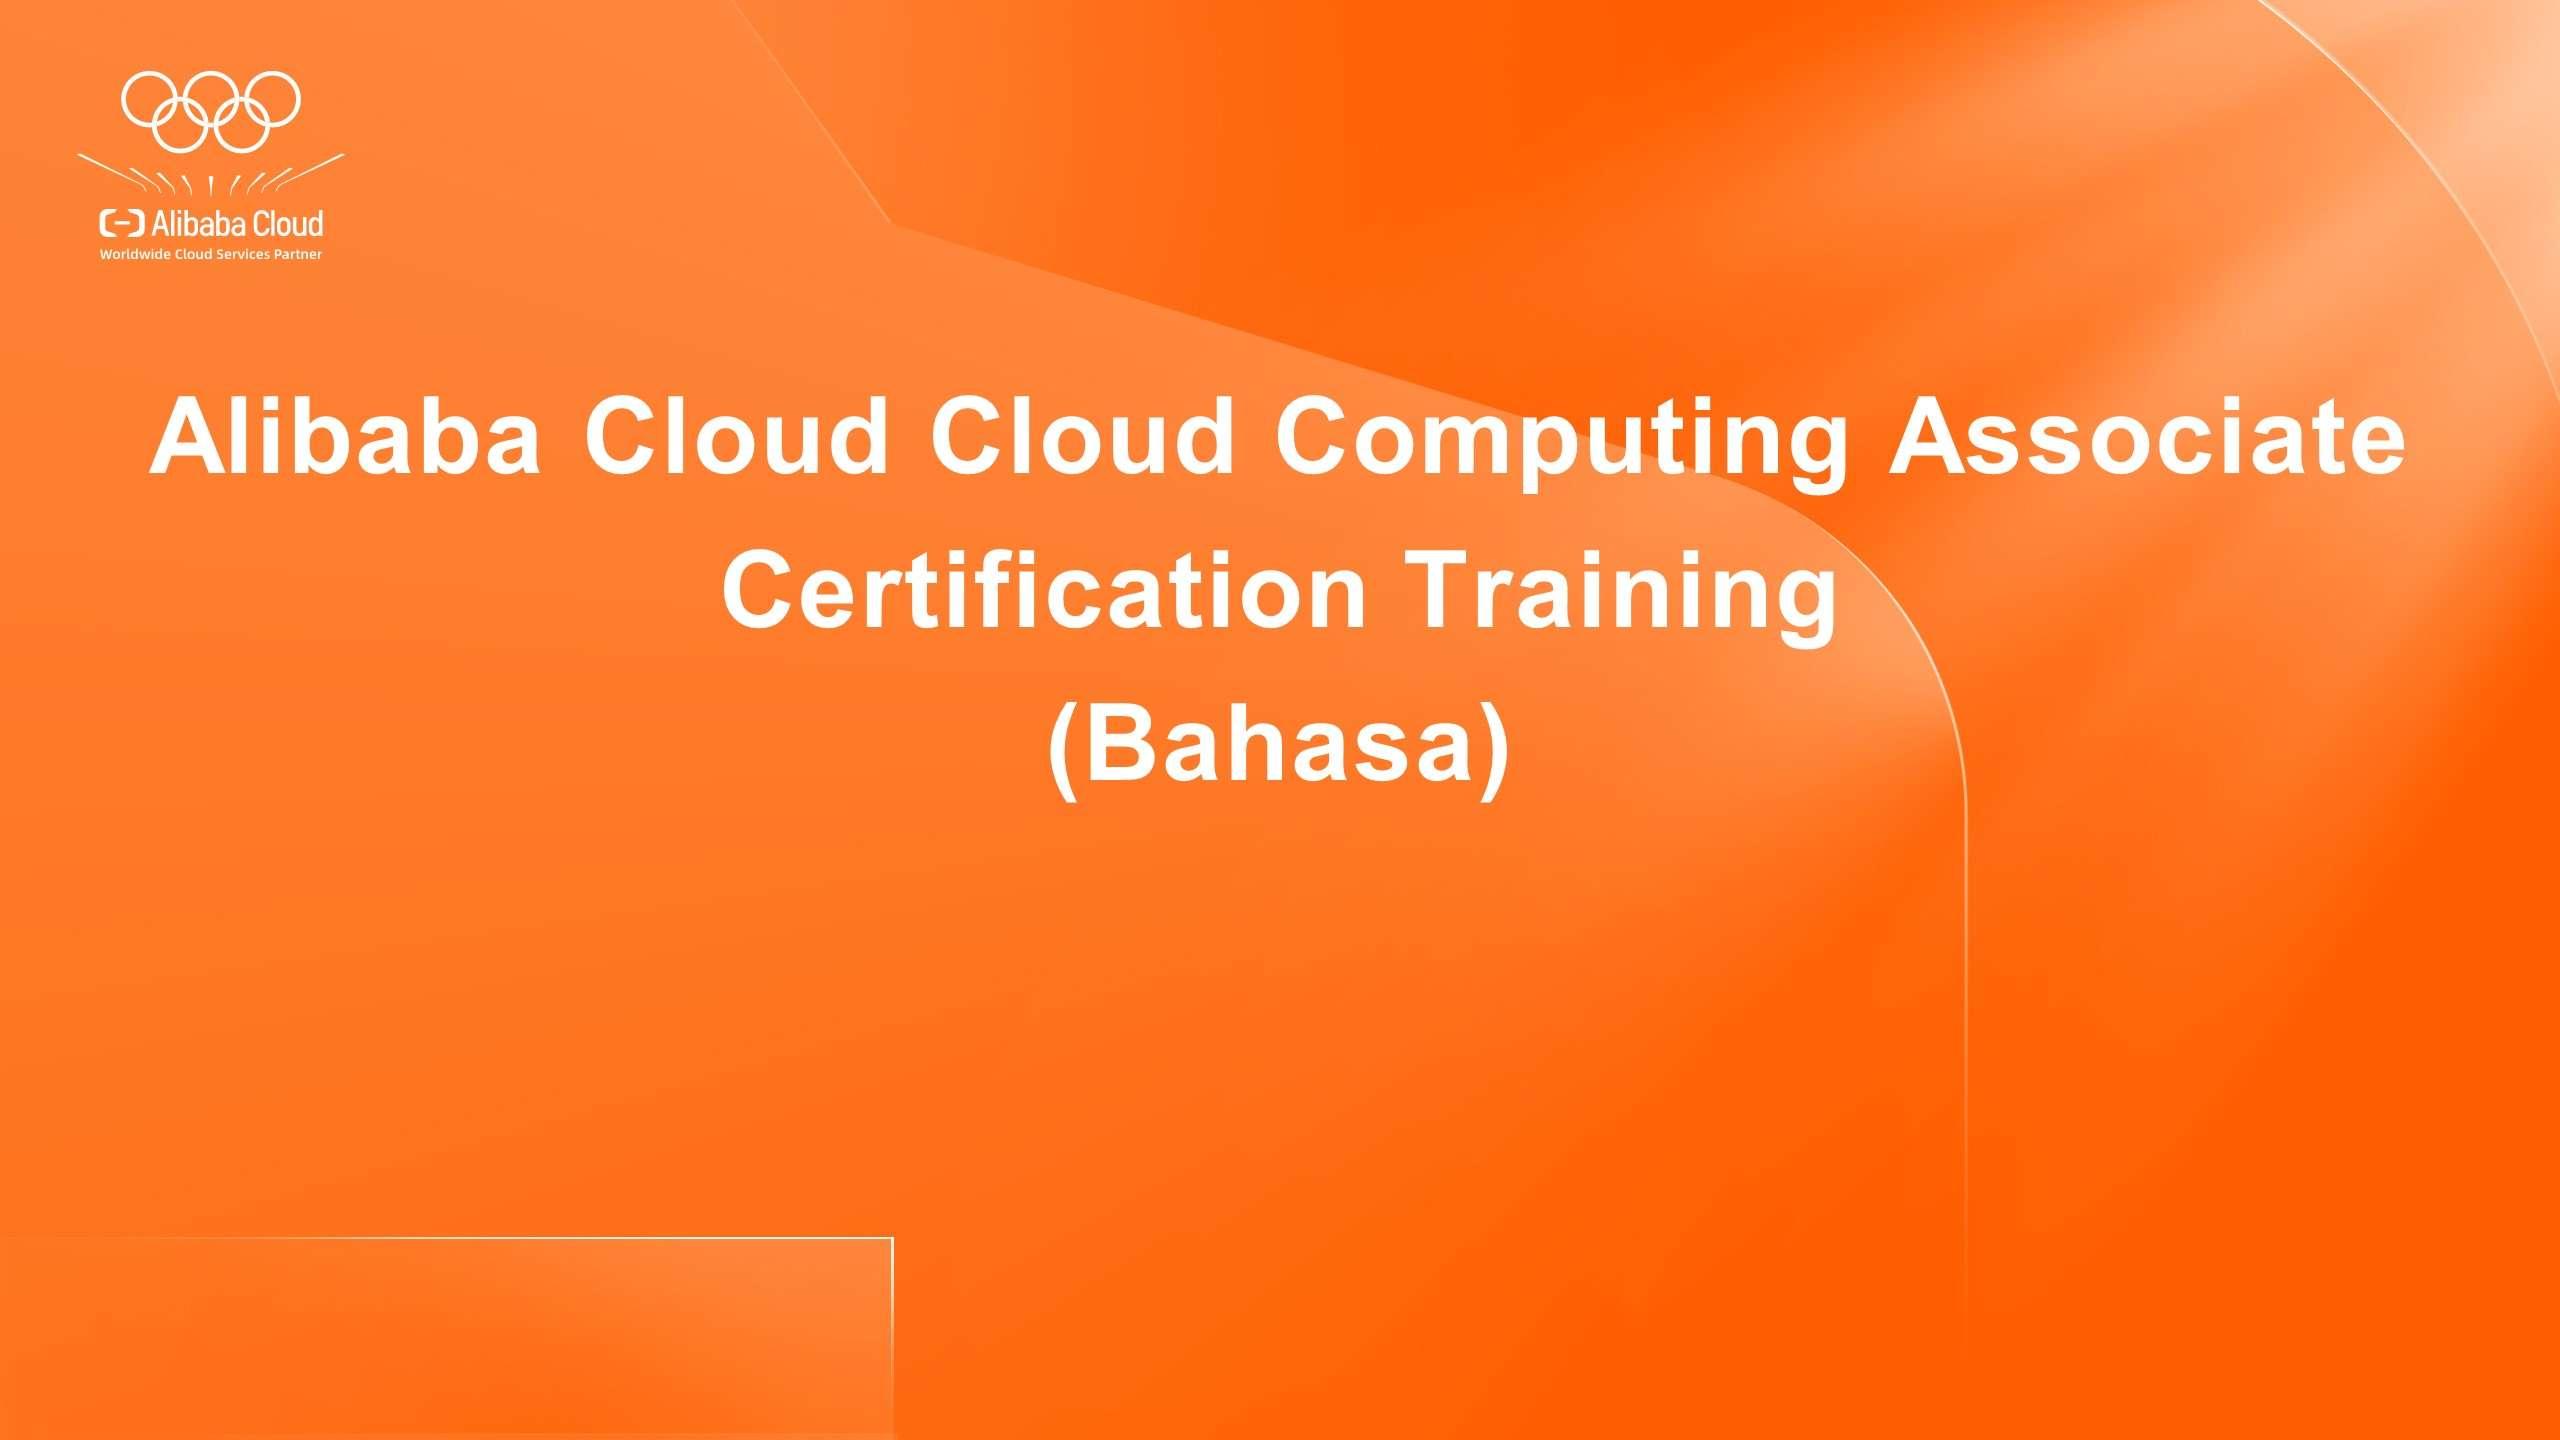 Alibaba Cloud Cloud Computing Associate Certification Training